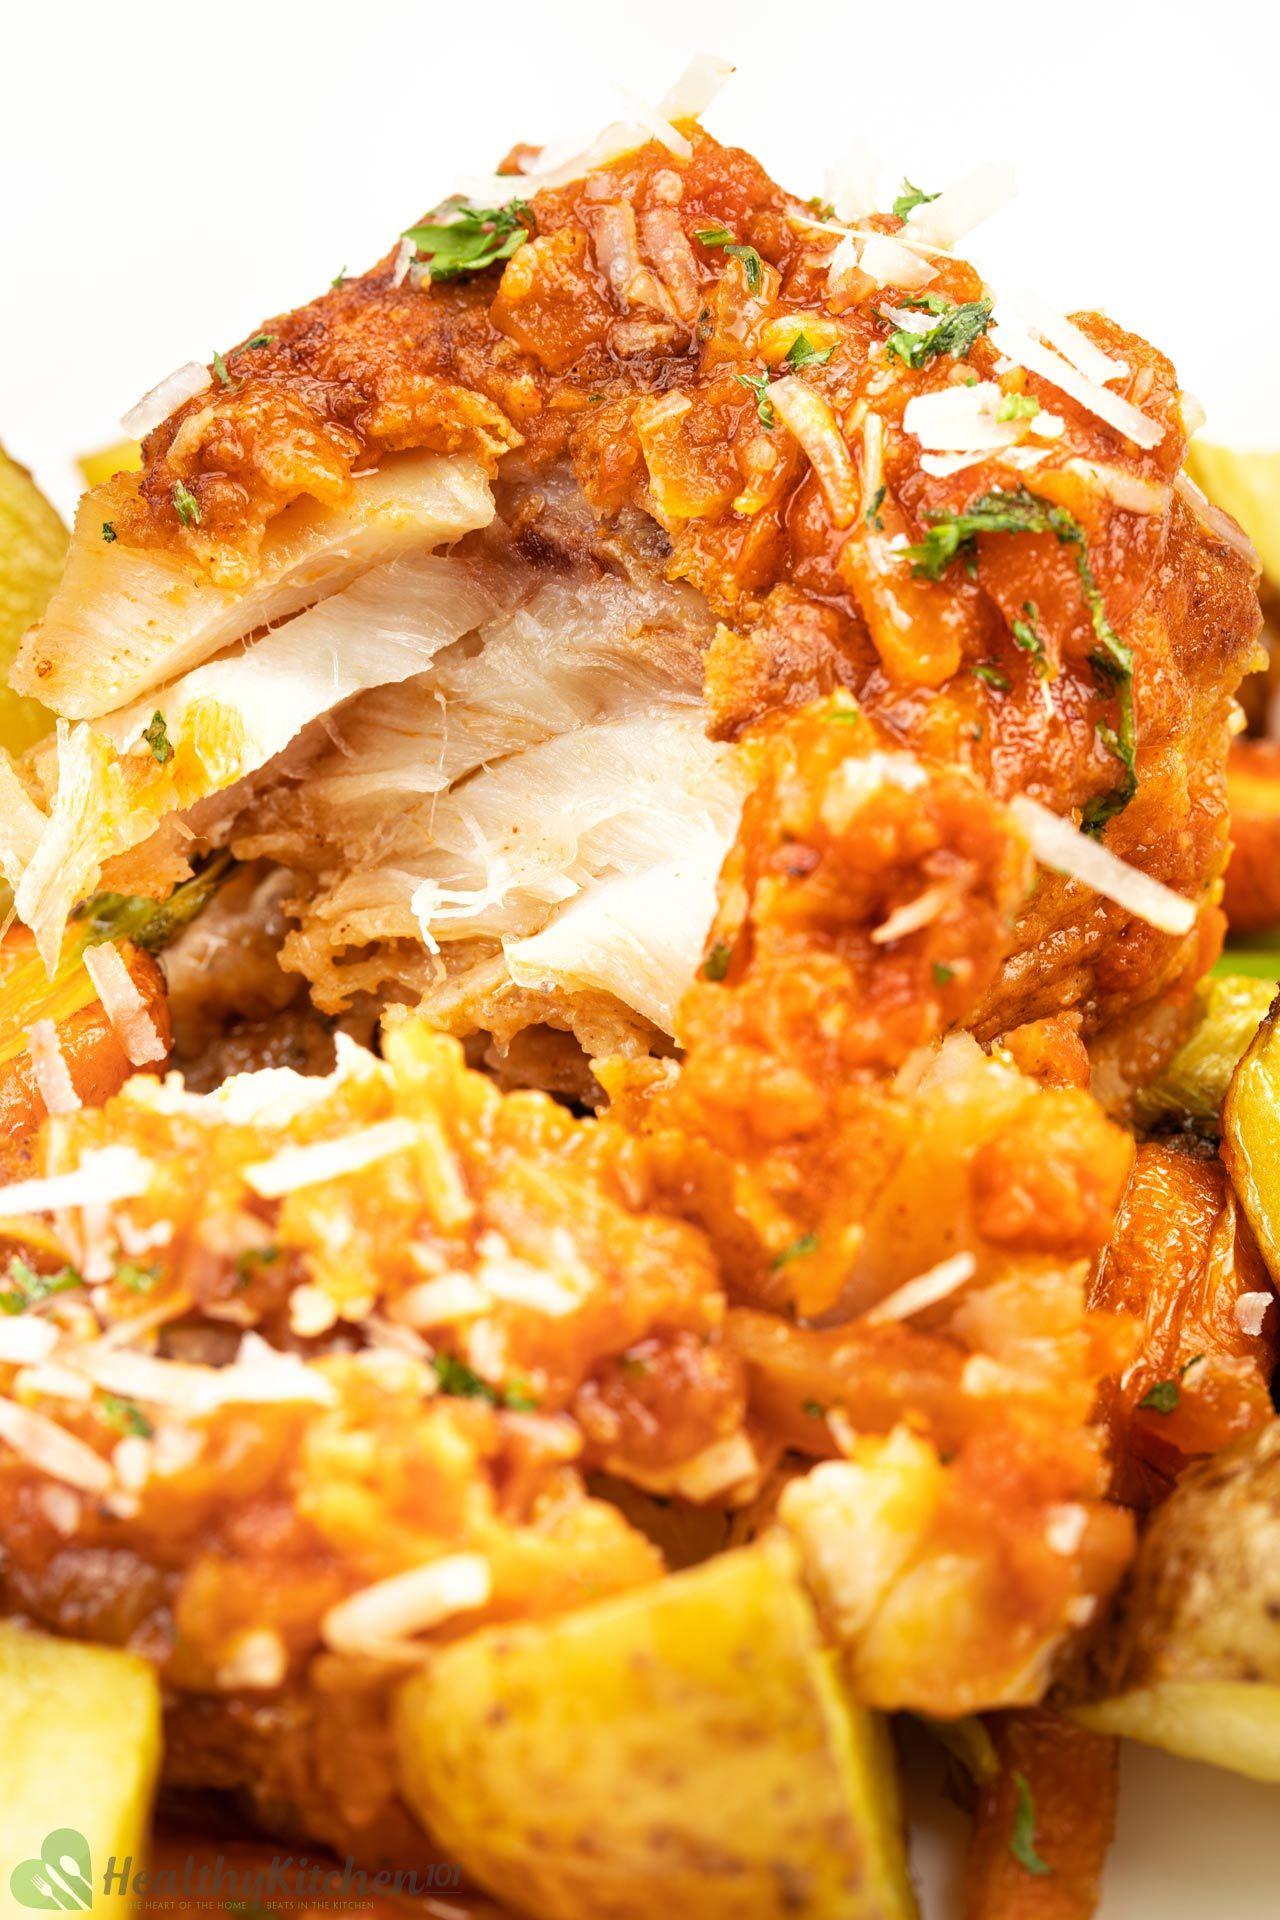 Homemade healthy Baked Cod Recipe